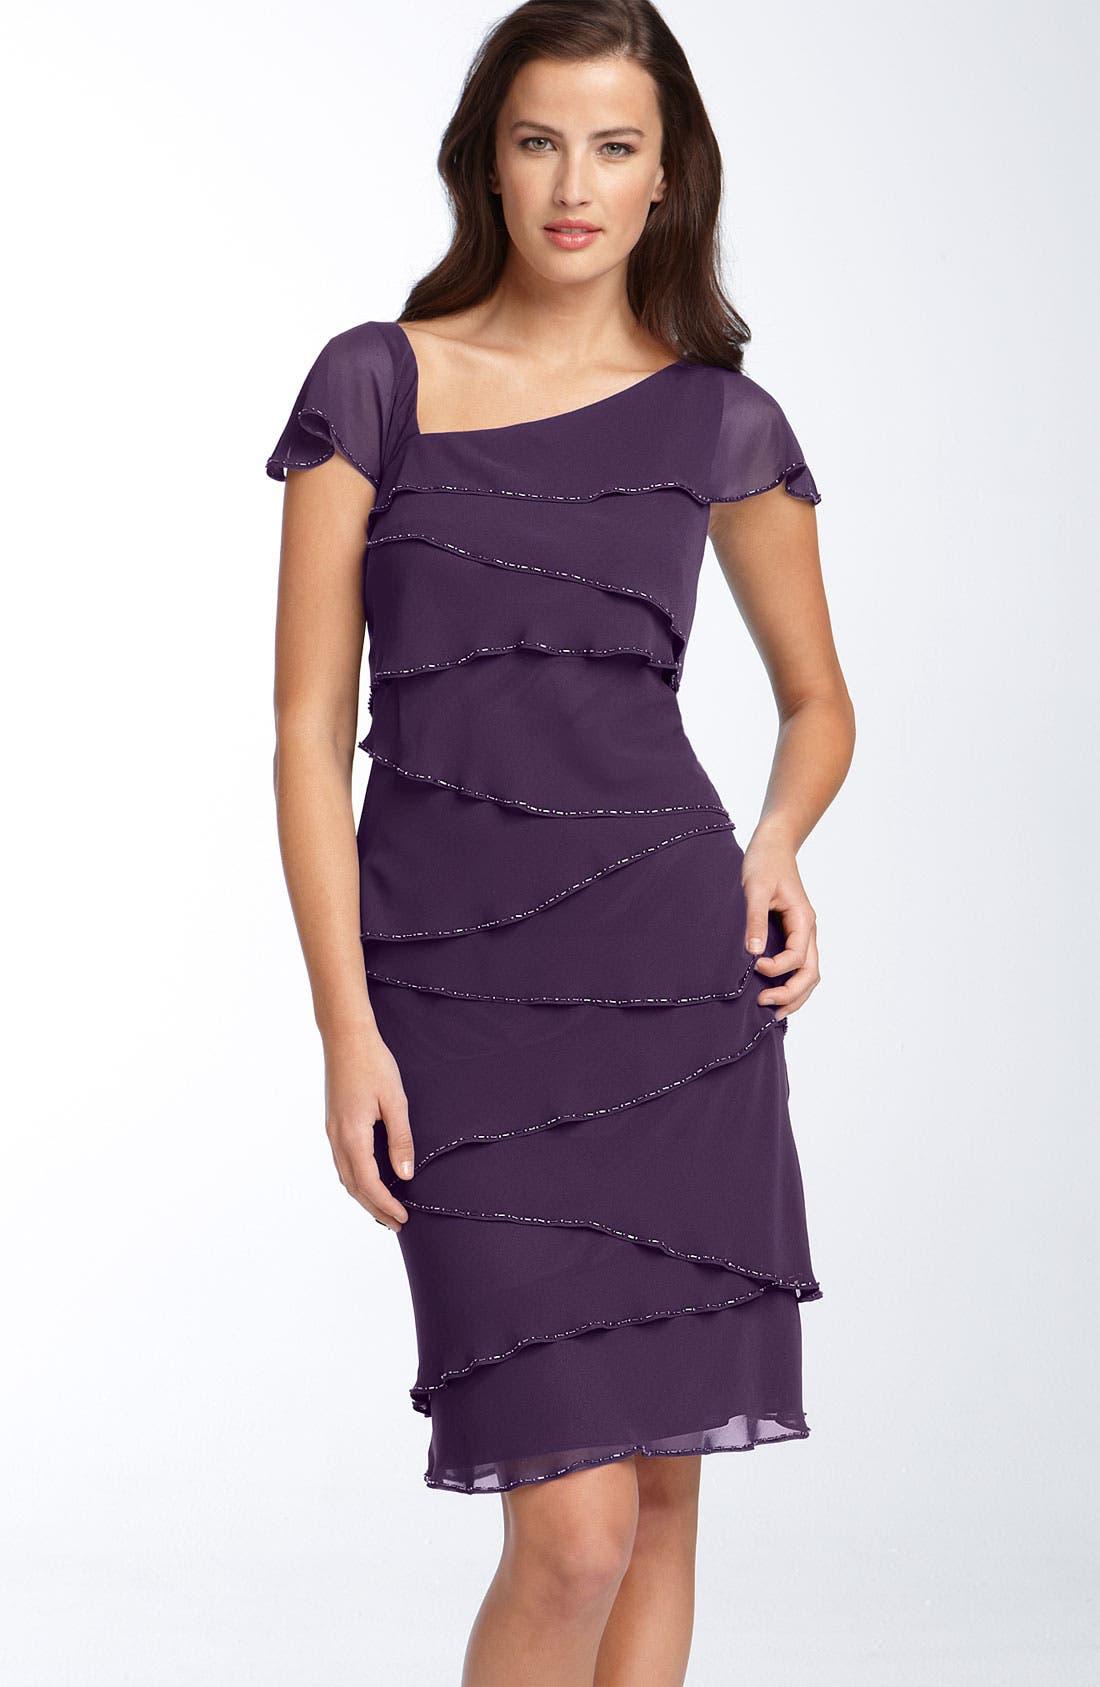 Alternate Image 1 Selected - Patra Asymmetrical Chiffon Sheath Dress